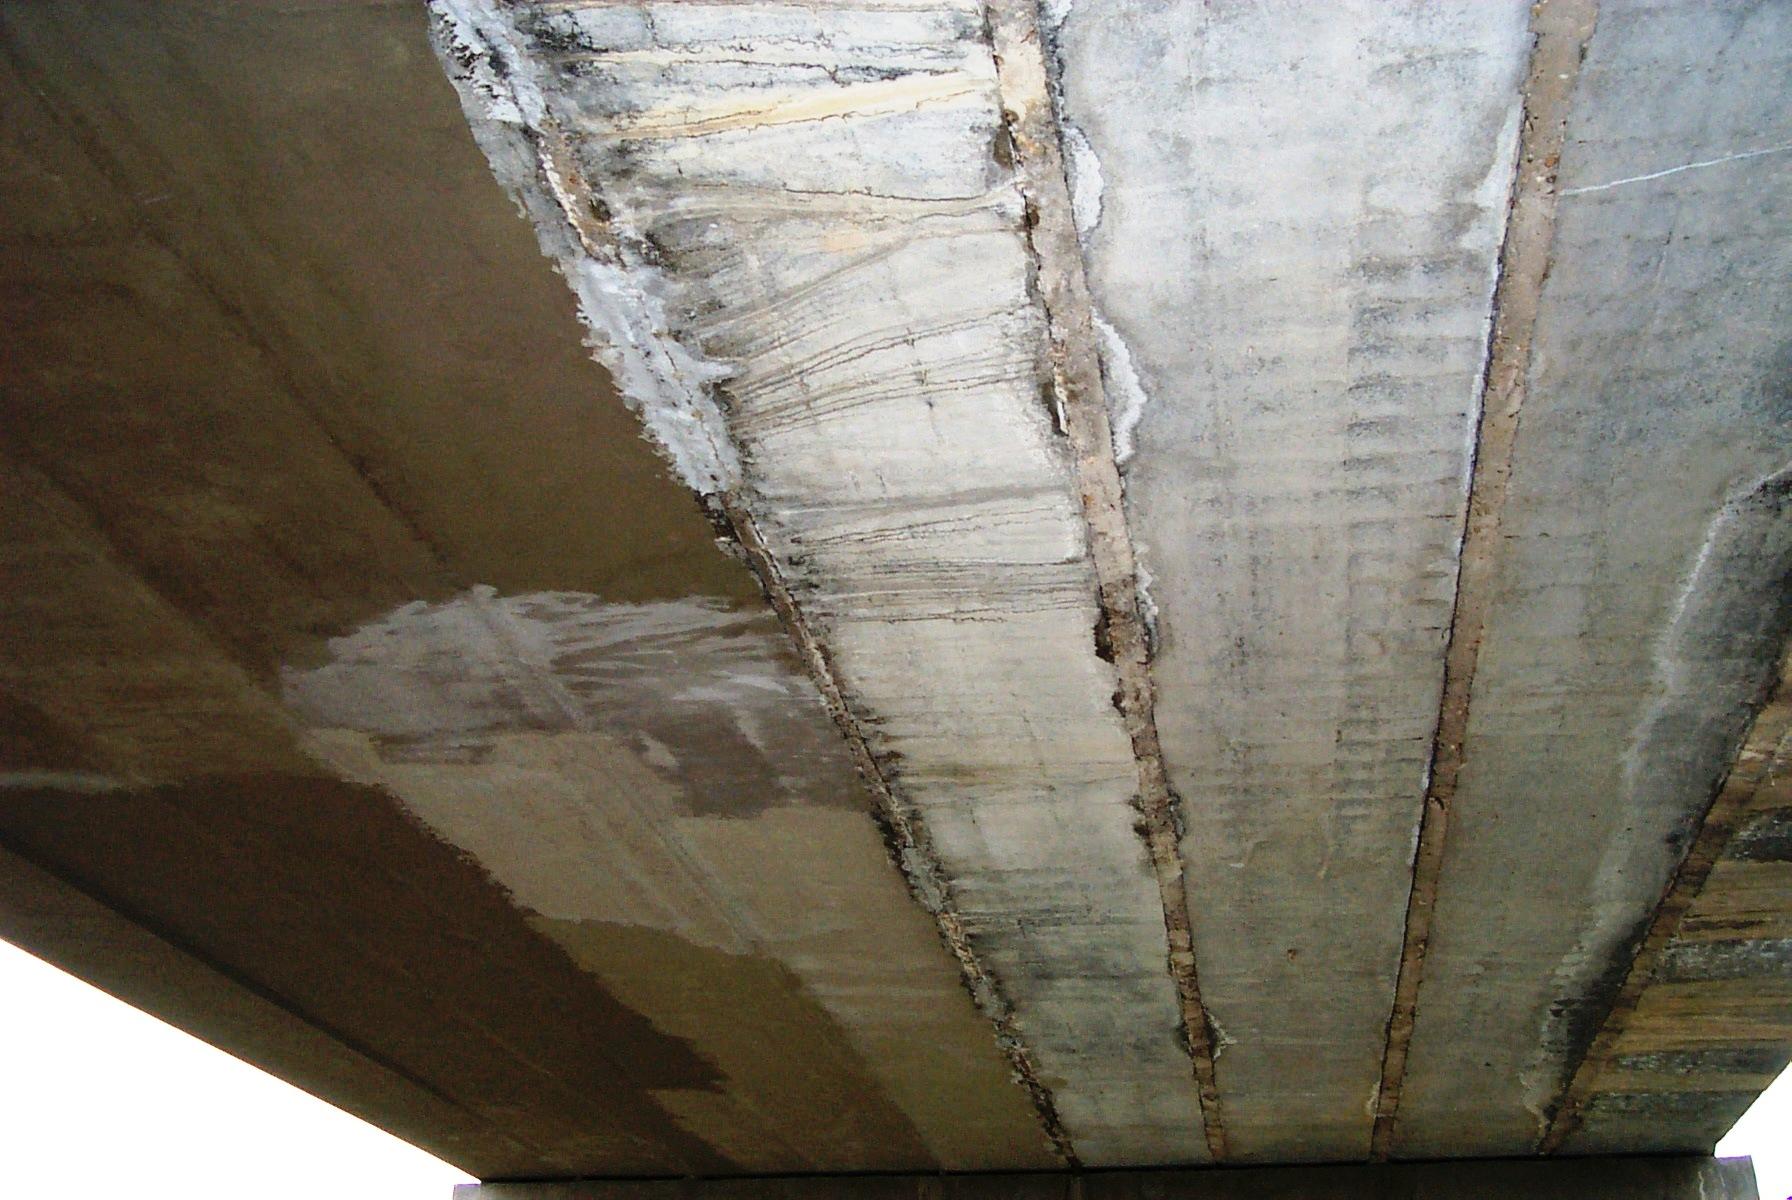 Reparatii pod (DN2), Km. 33 - 028, peste raul Calnistea MAPEI - Poza 14